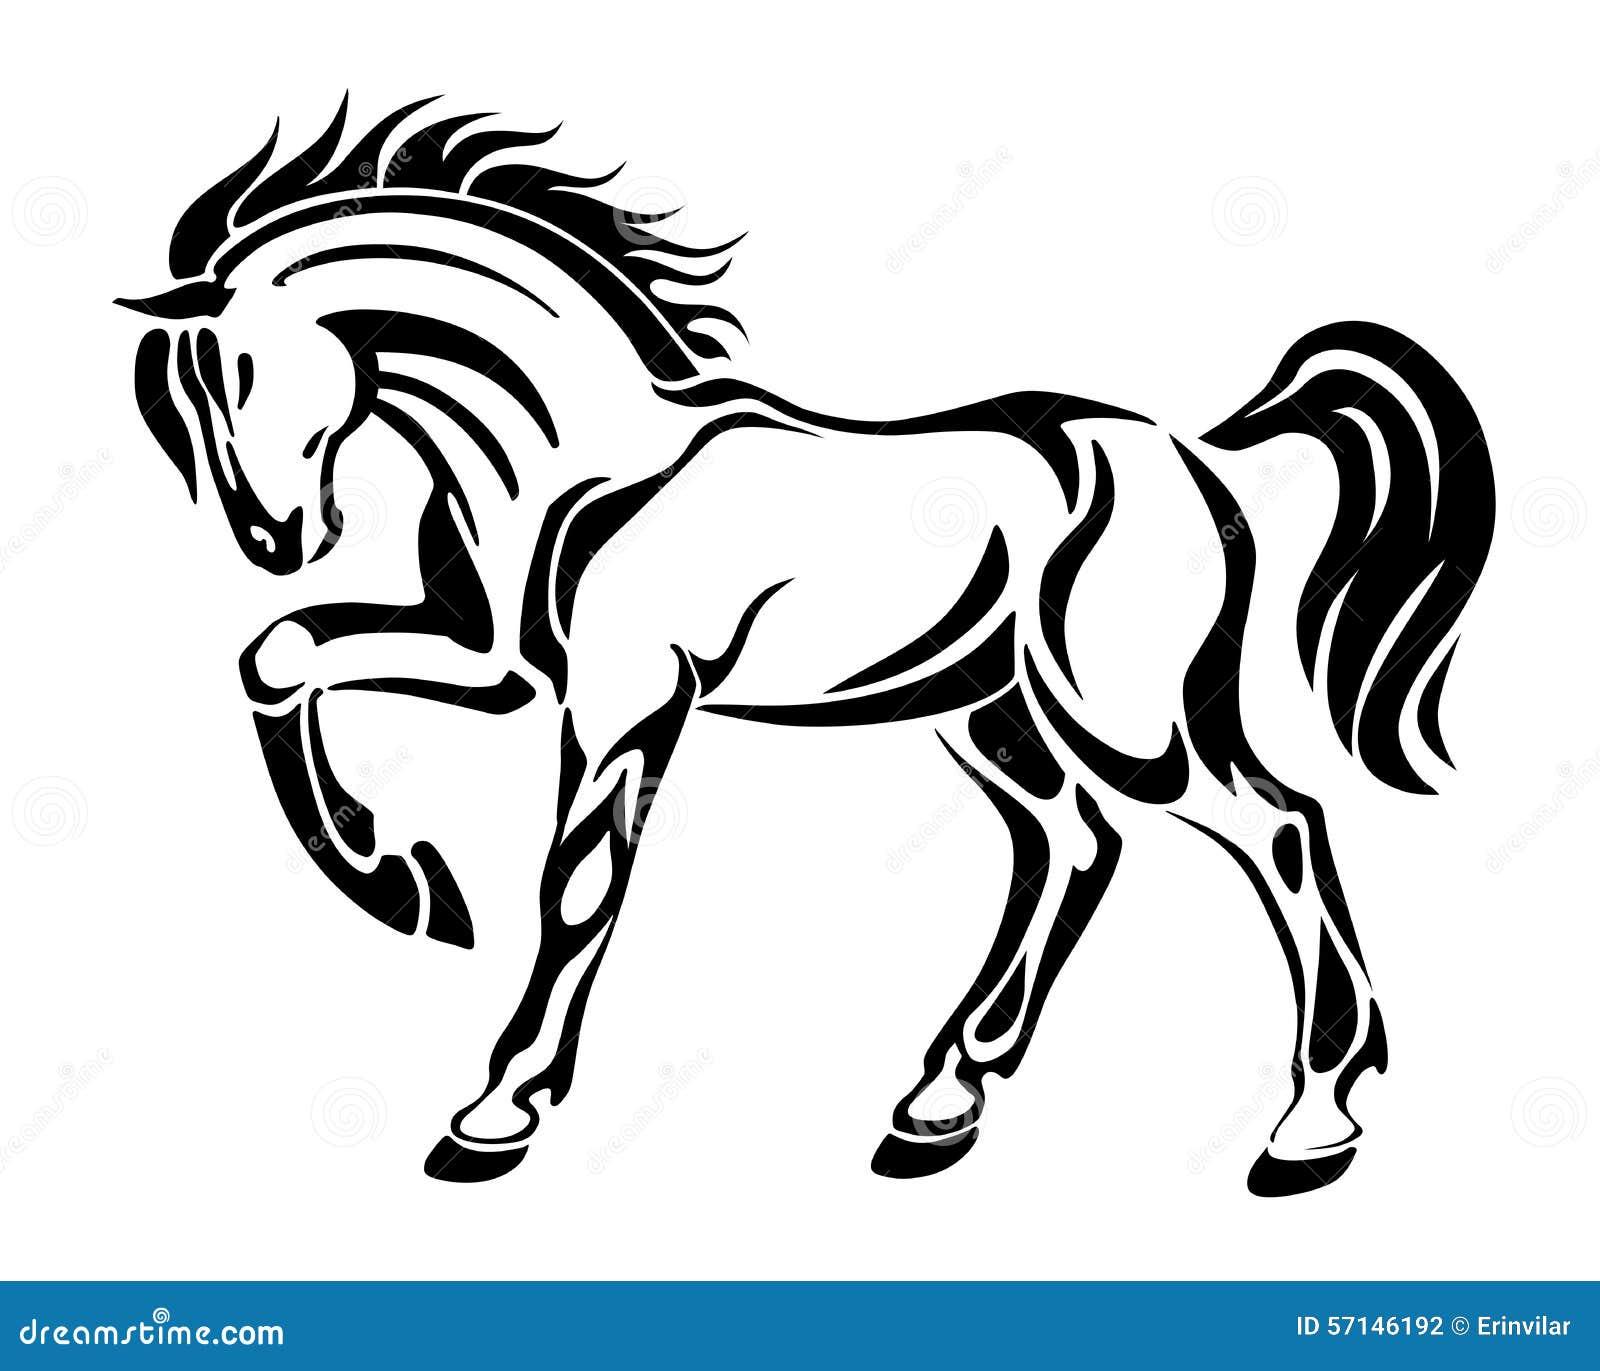 Horse tattoo stylized graphic vector abstract image for Cavallo stilizzato